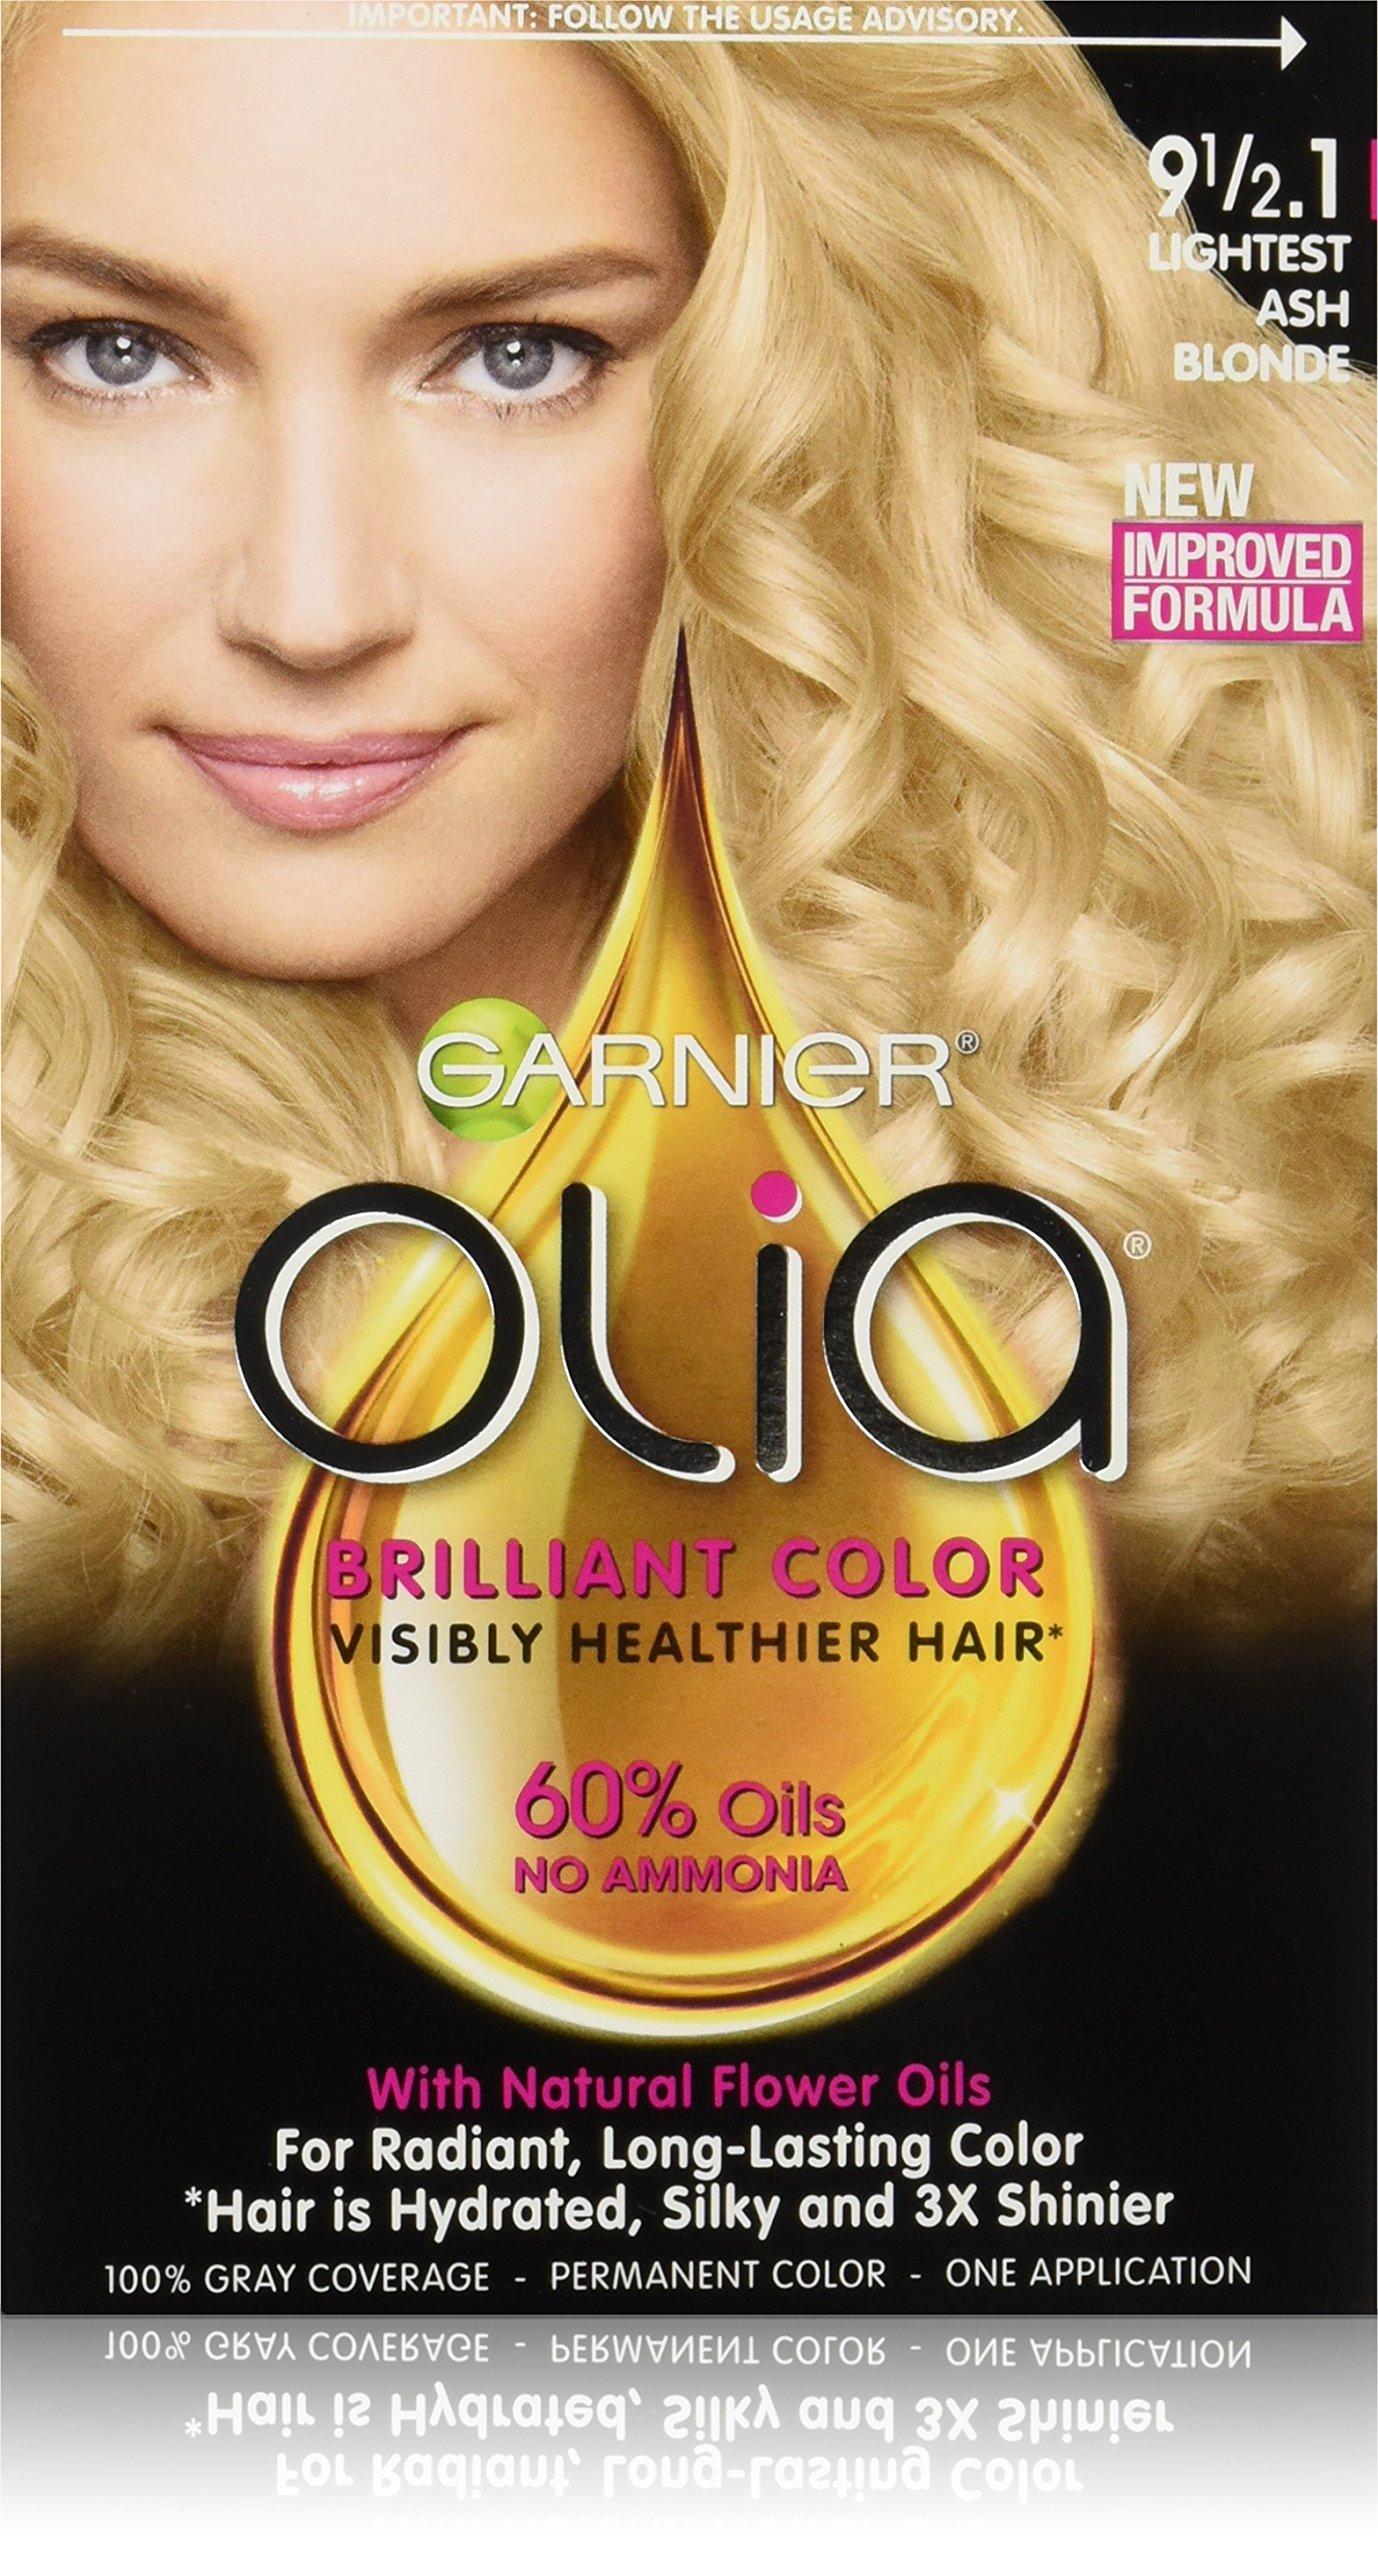 Amazon Garnier Olia Hair Color 9 121 Lightest Ash Blonde